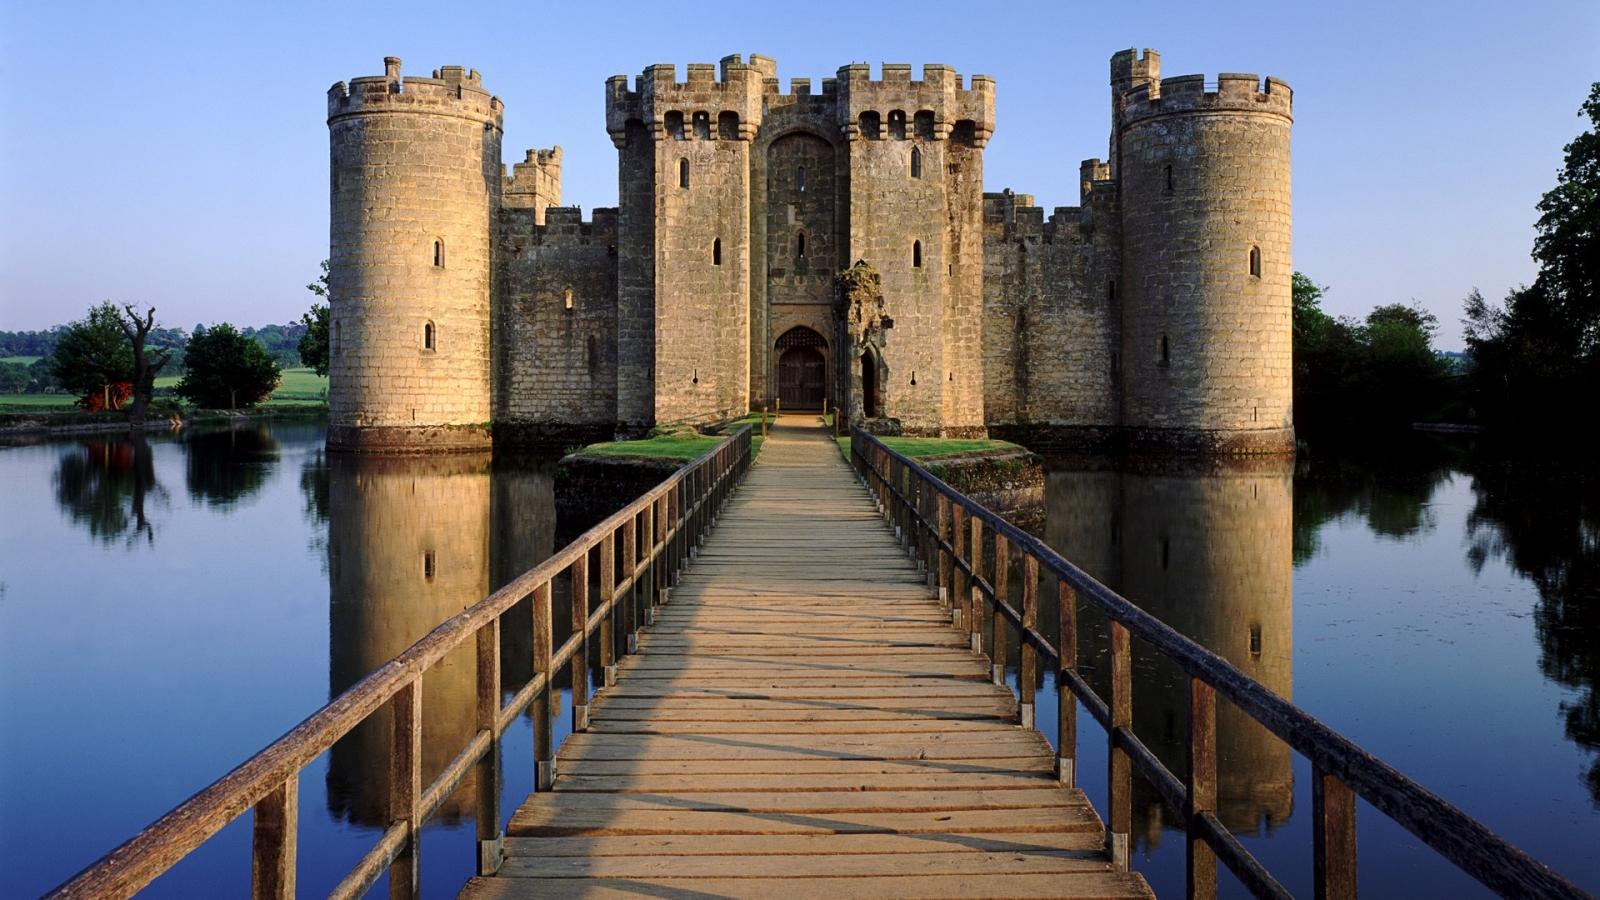 El castillo Bodia en Inglaterra - 1600x900